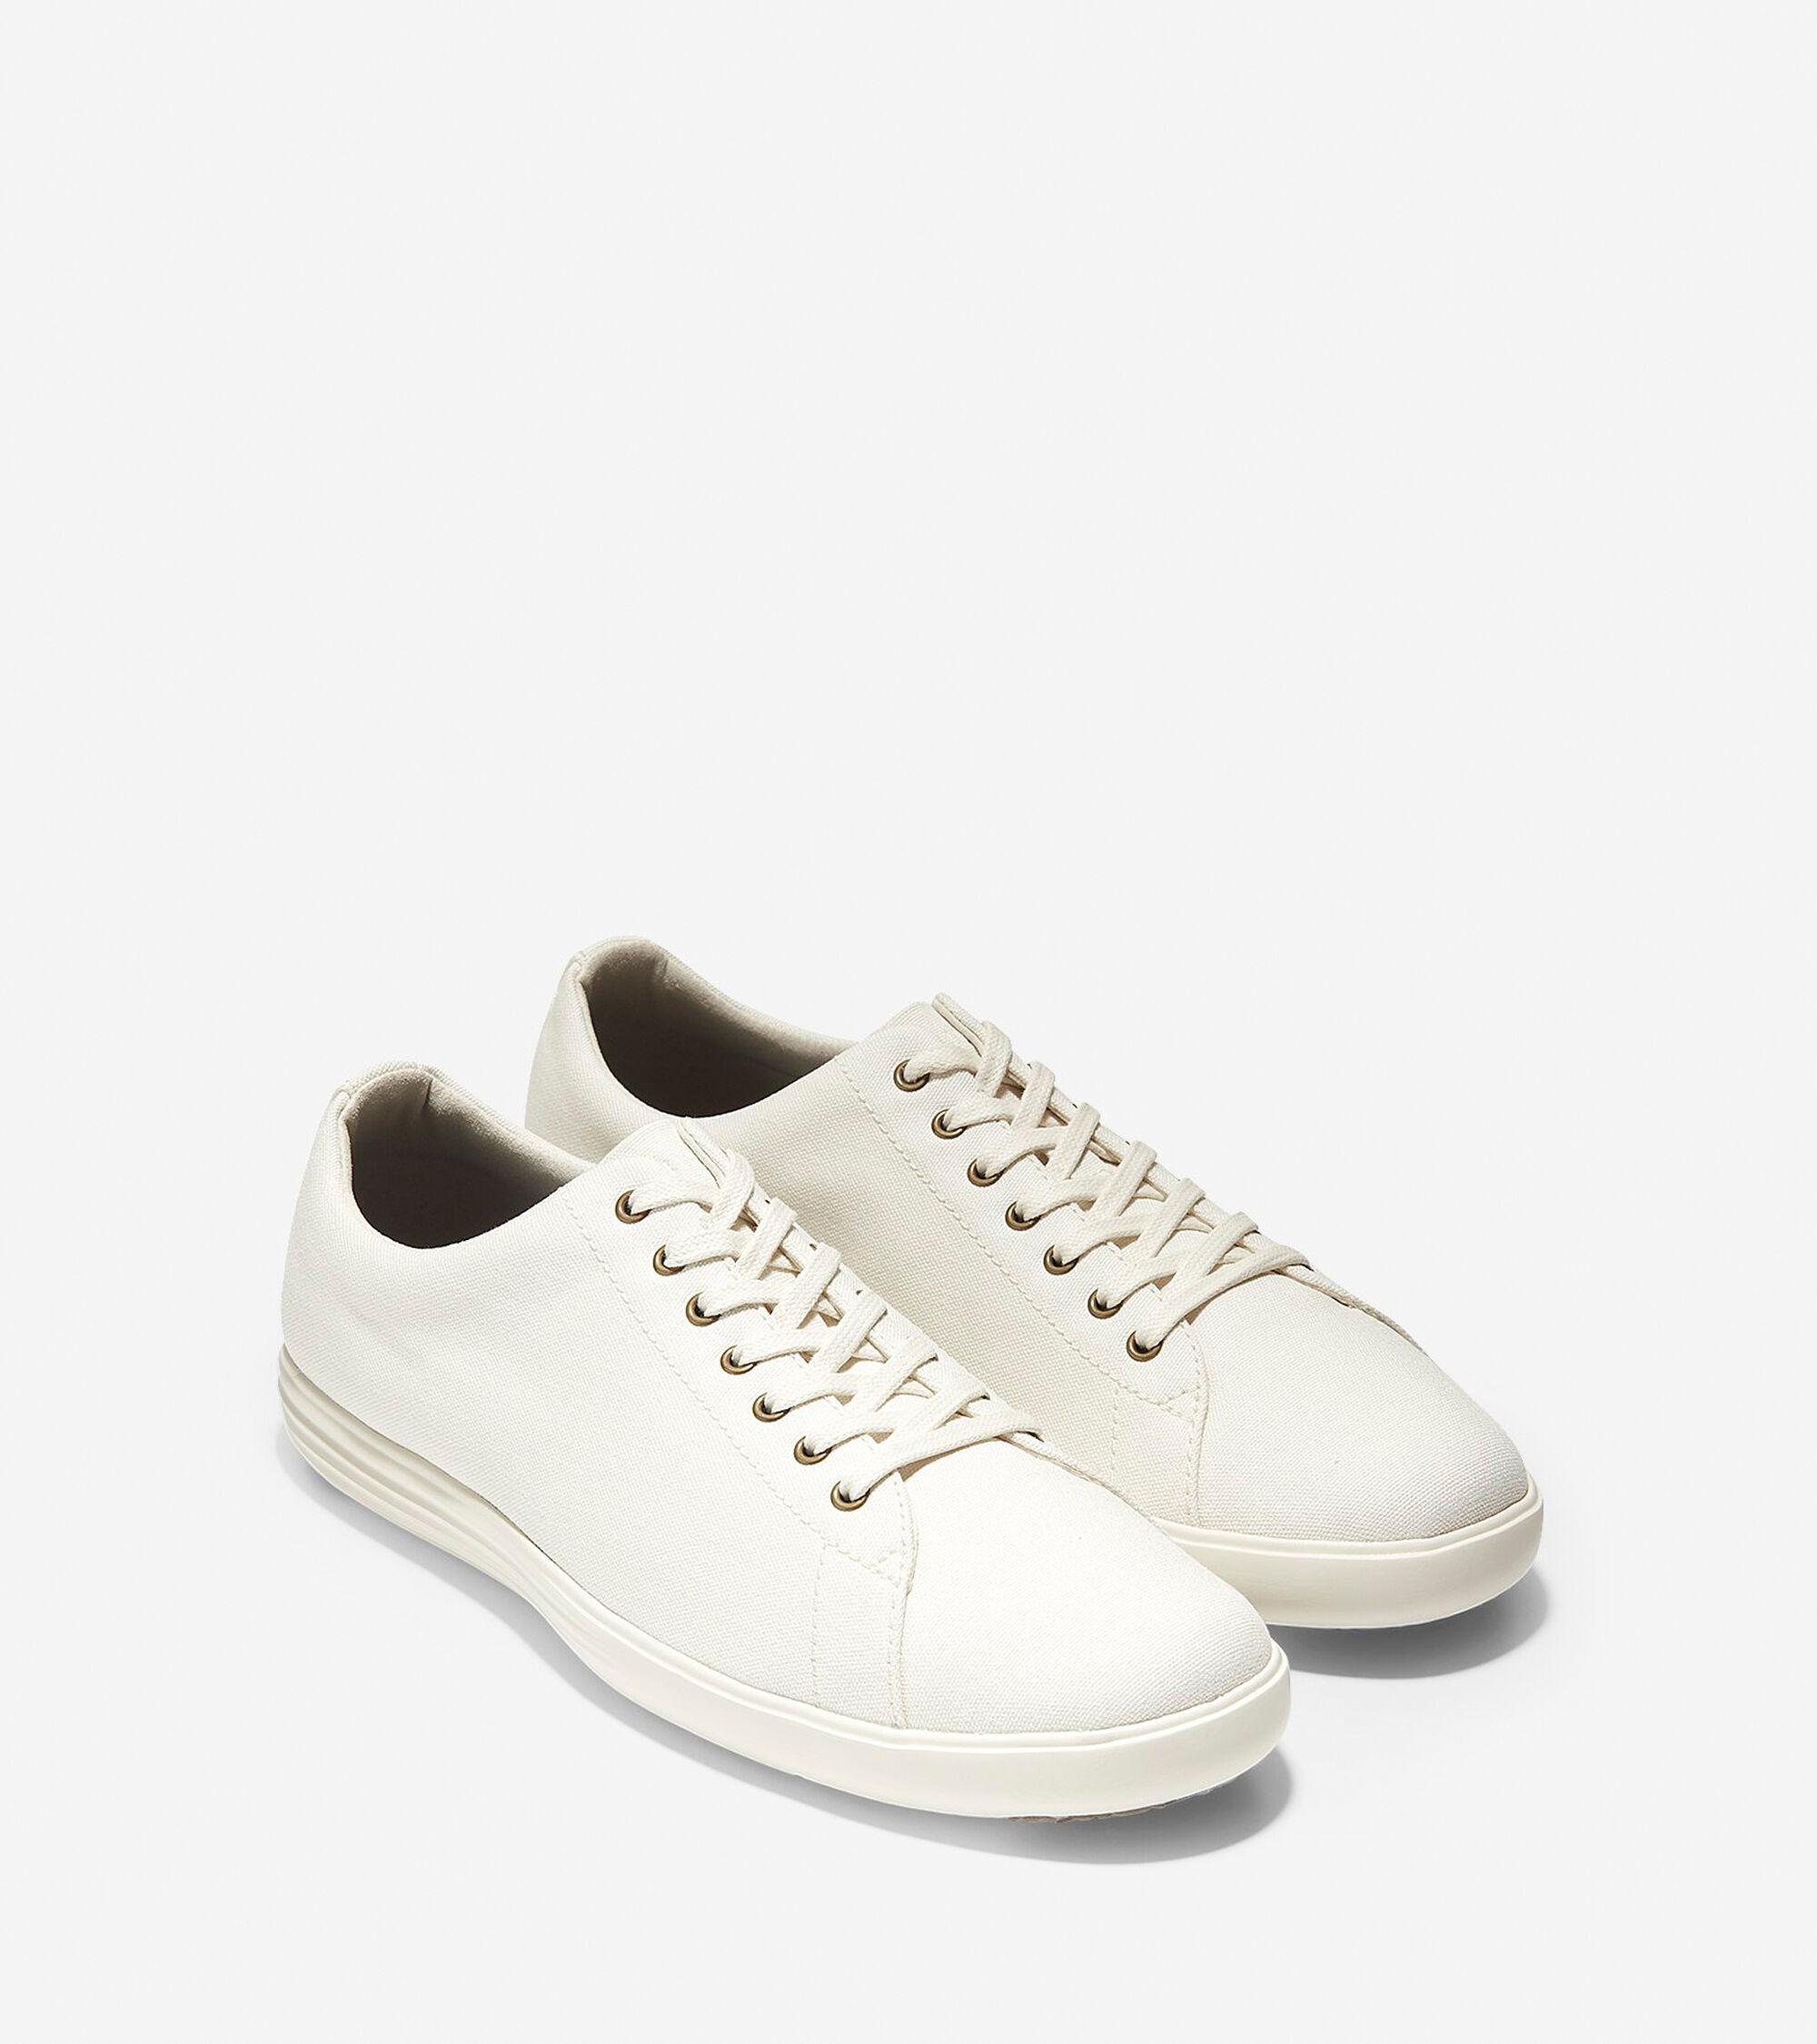 e506c4c8a45a Men s Grand Crosscourt Sneakers in Ivory Canvas